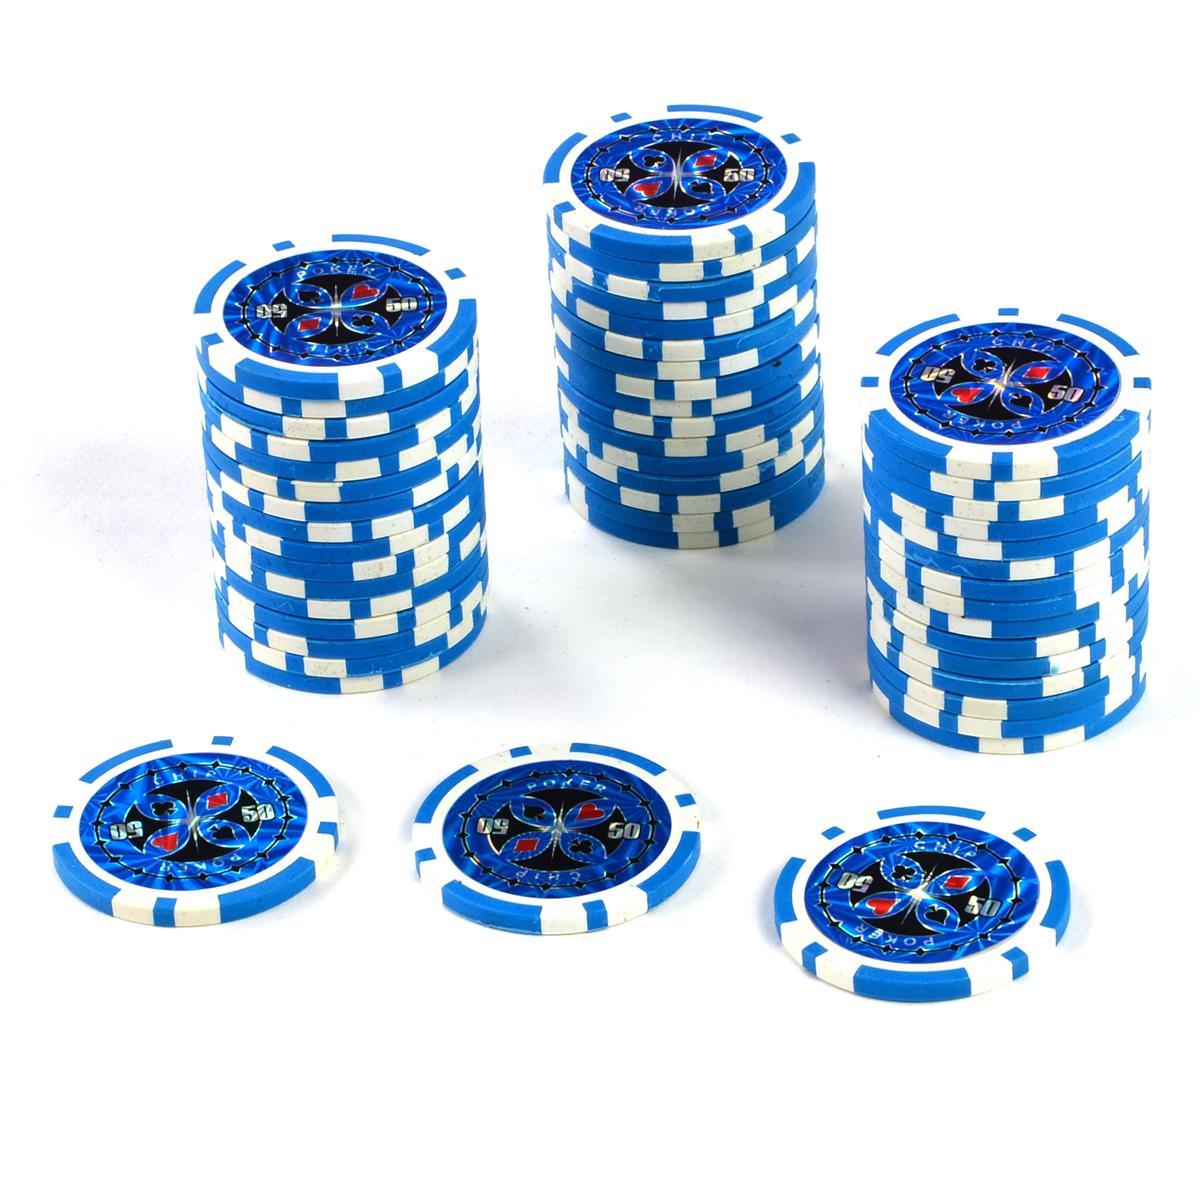 50 Poker-Chips Wert 50 Laserchip 12g Metallkern ergänzend zum Pokerkoffer